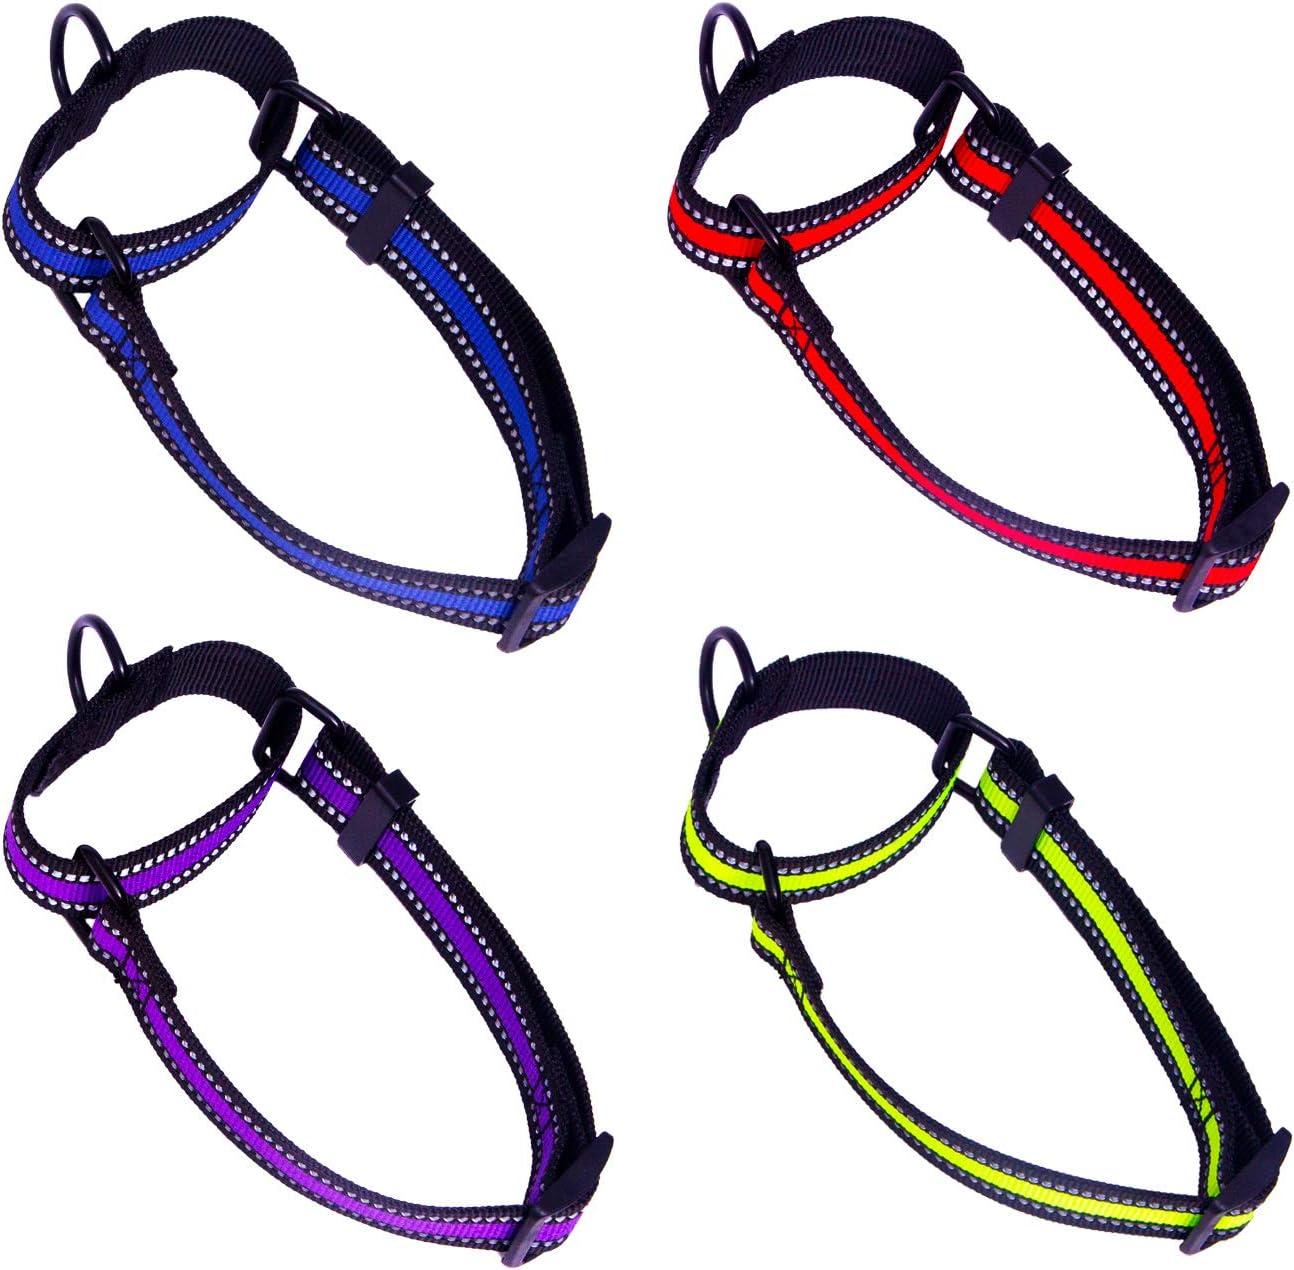 Collar for dog Width 4 cm White Dog Collar Slip Collar For Dog Wide Dog Collar Limited